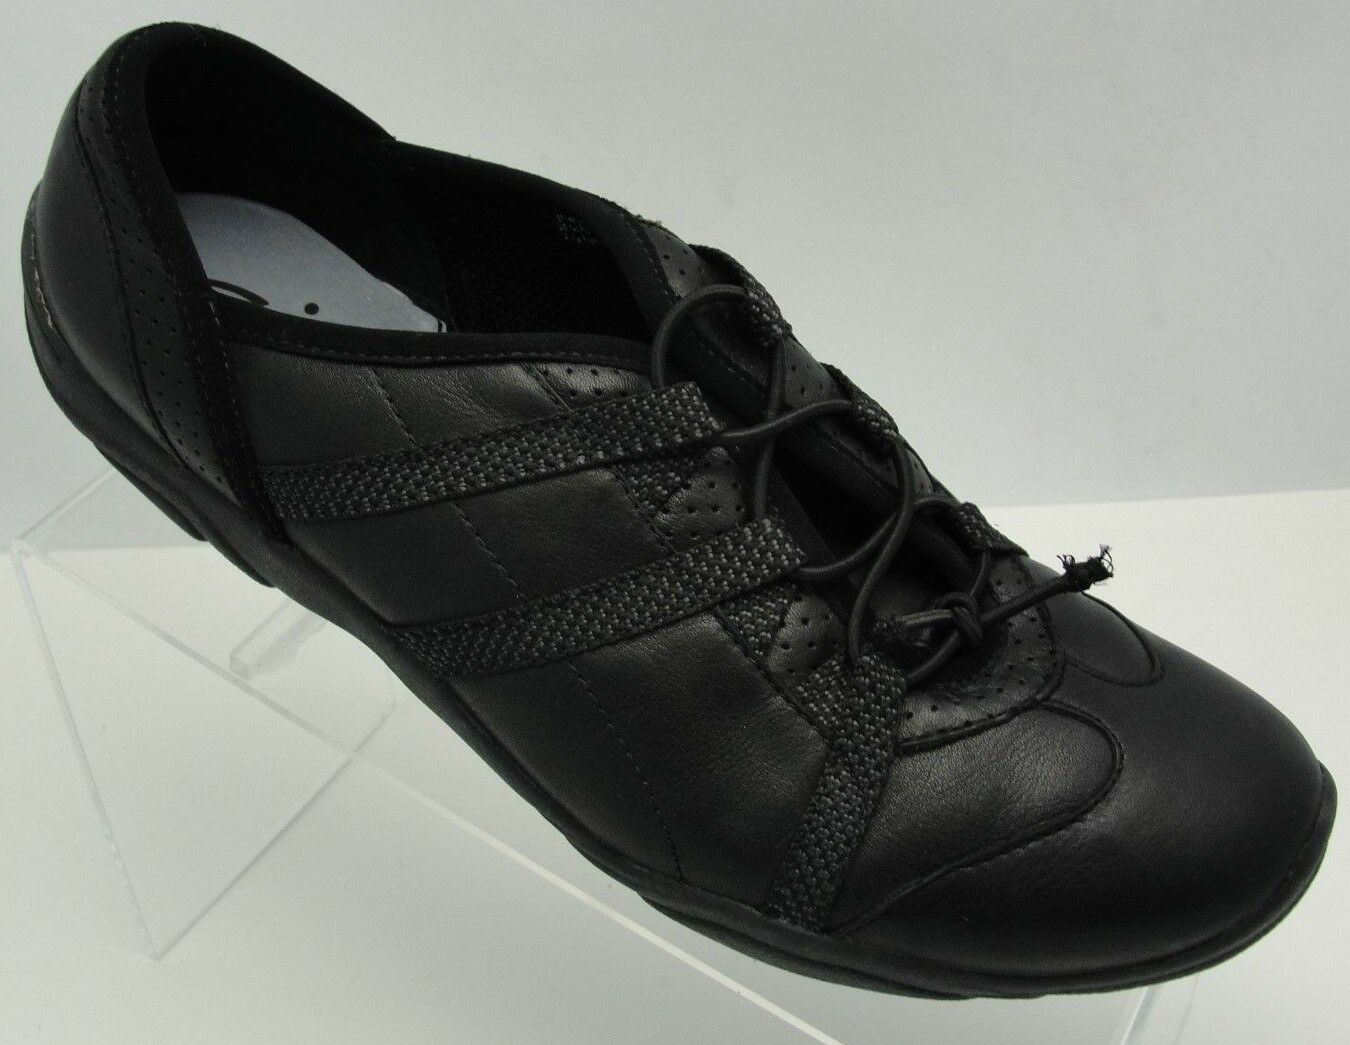 CLARKS negro LEATHER zapatillas WALKING COMFORT STRETCH STRETCH STRETCH WORK zapatos mujer SZ 9.5  venta caliente en línea